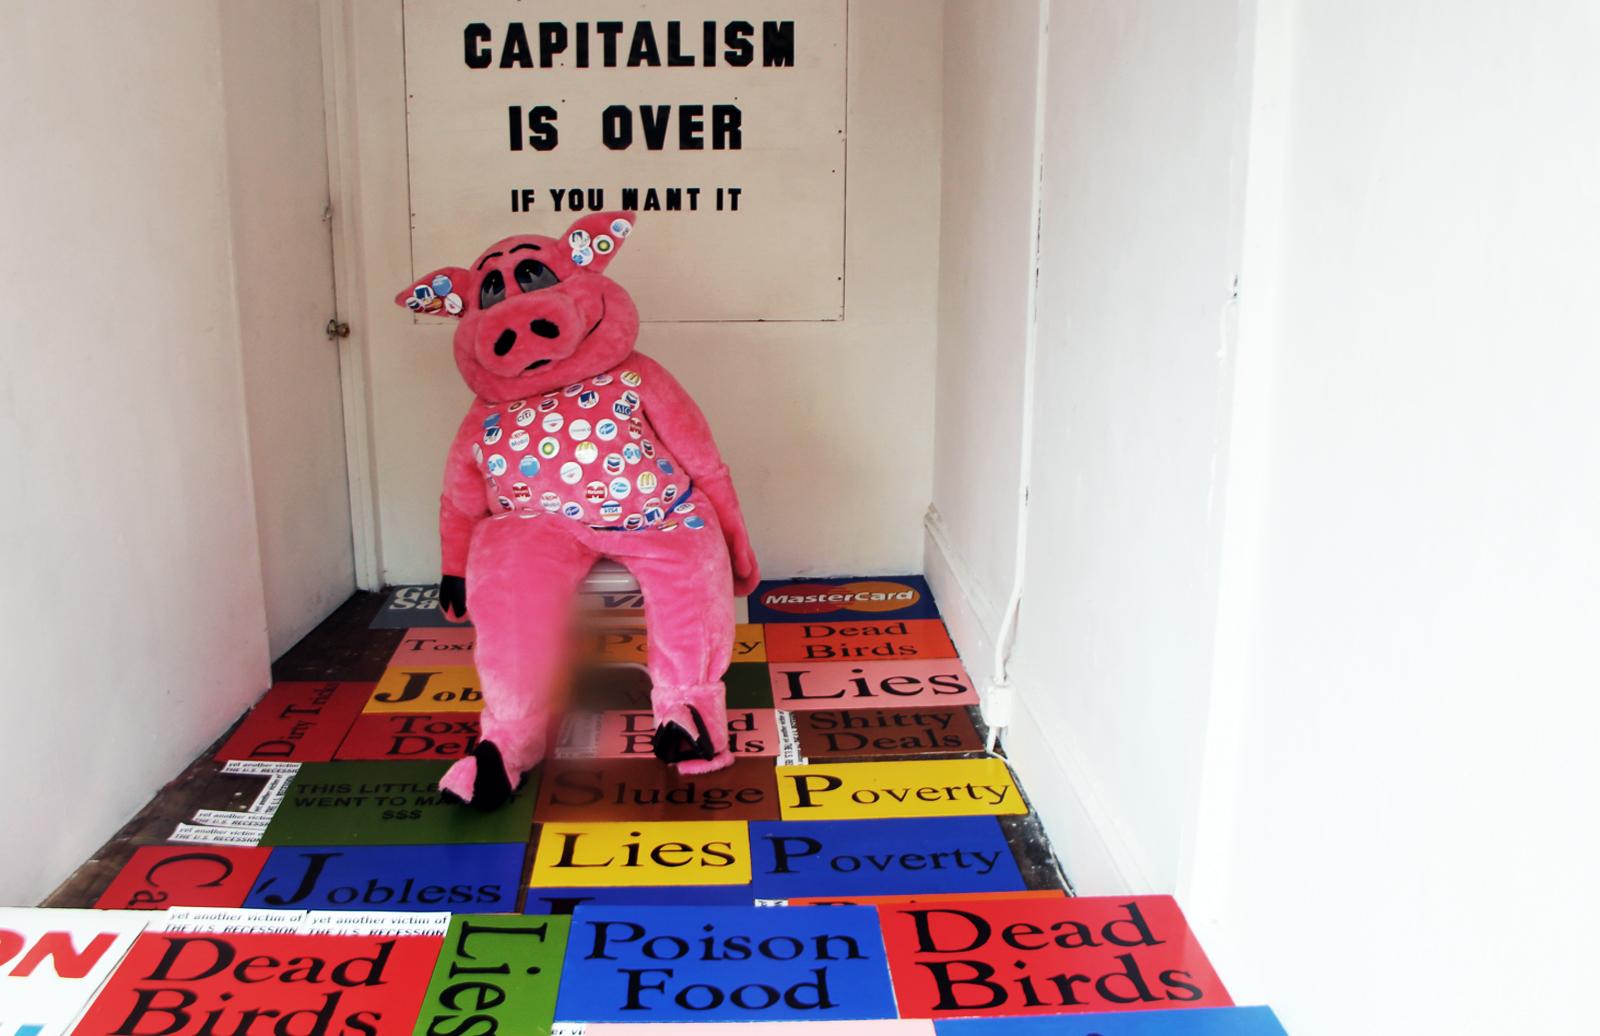 Someone Doesn't Like Capitalism